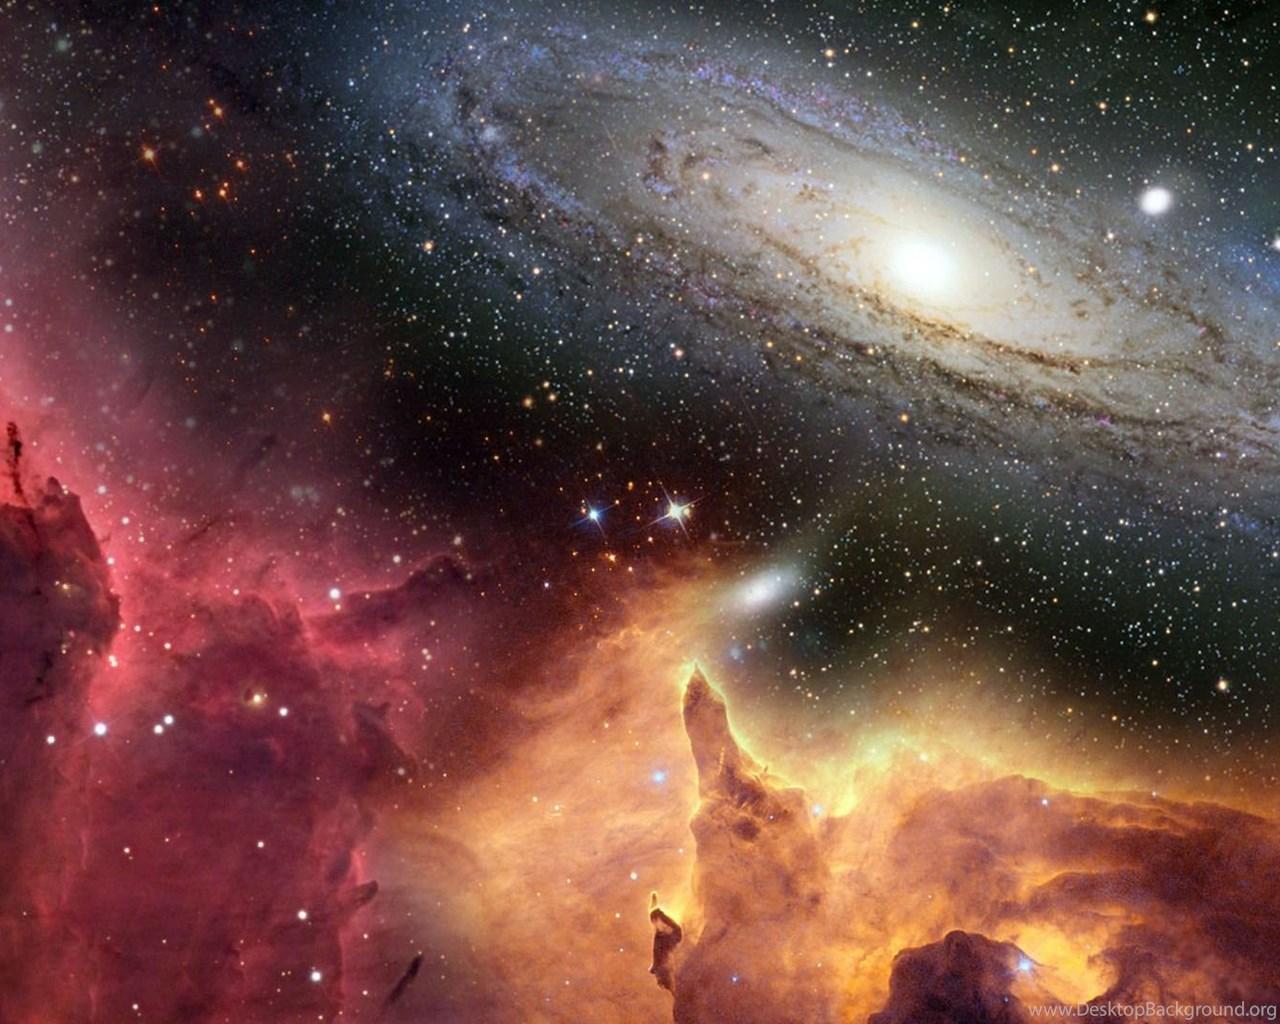 56537 red galaxy nebula wallpapers hd 1080p page 2 pics about